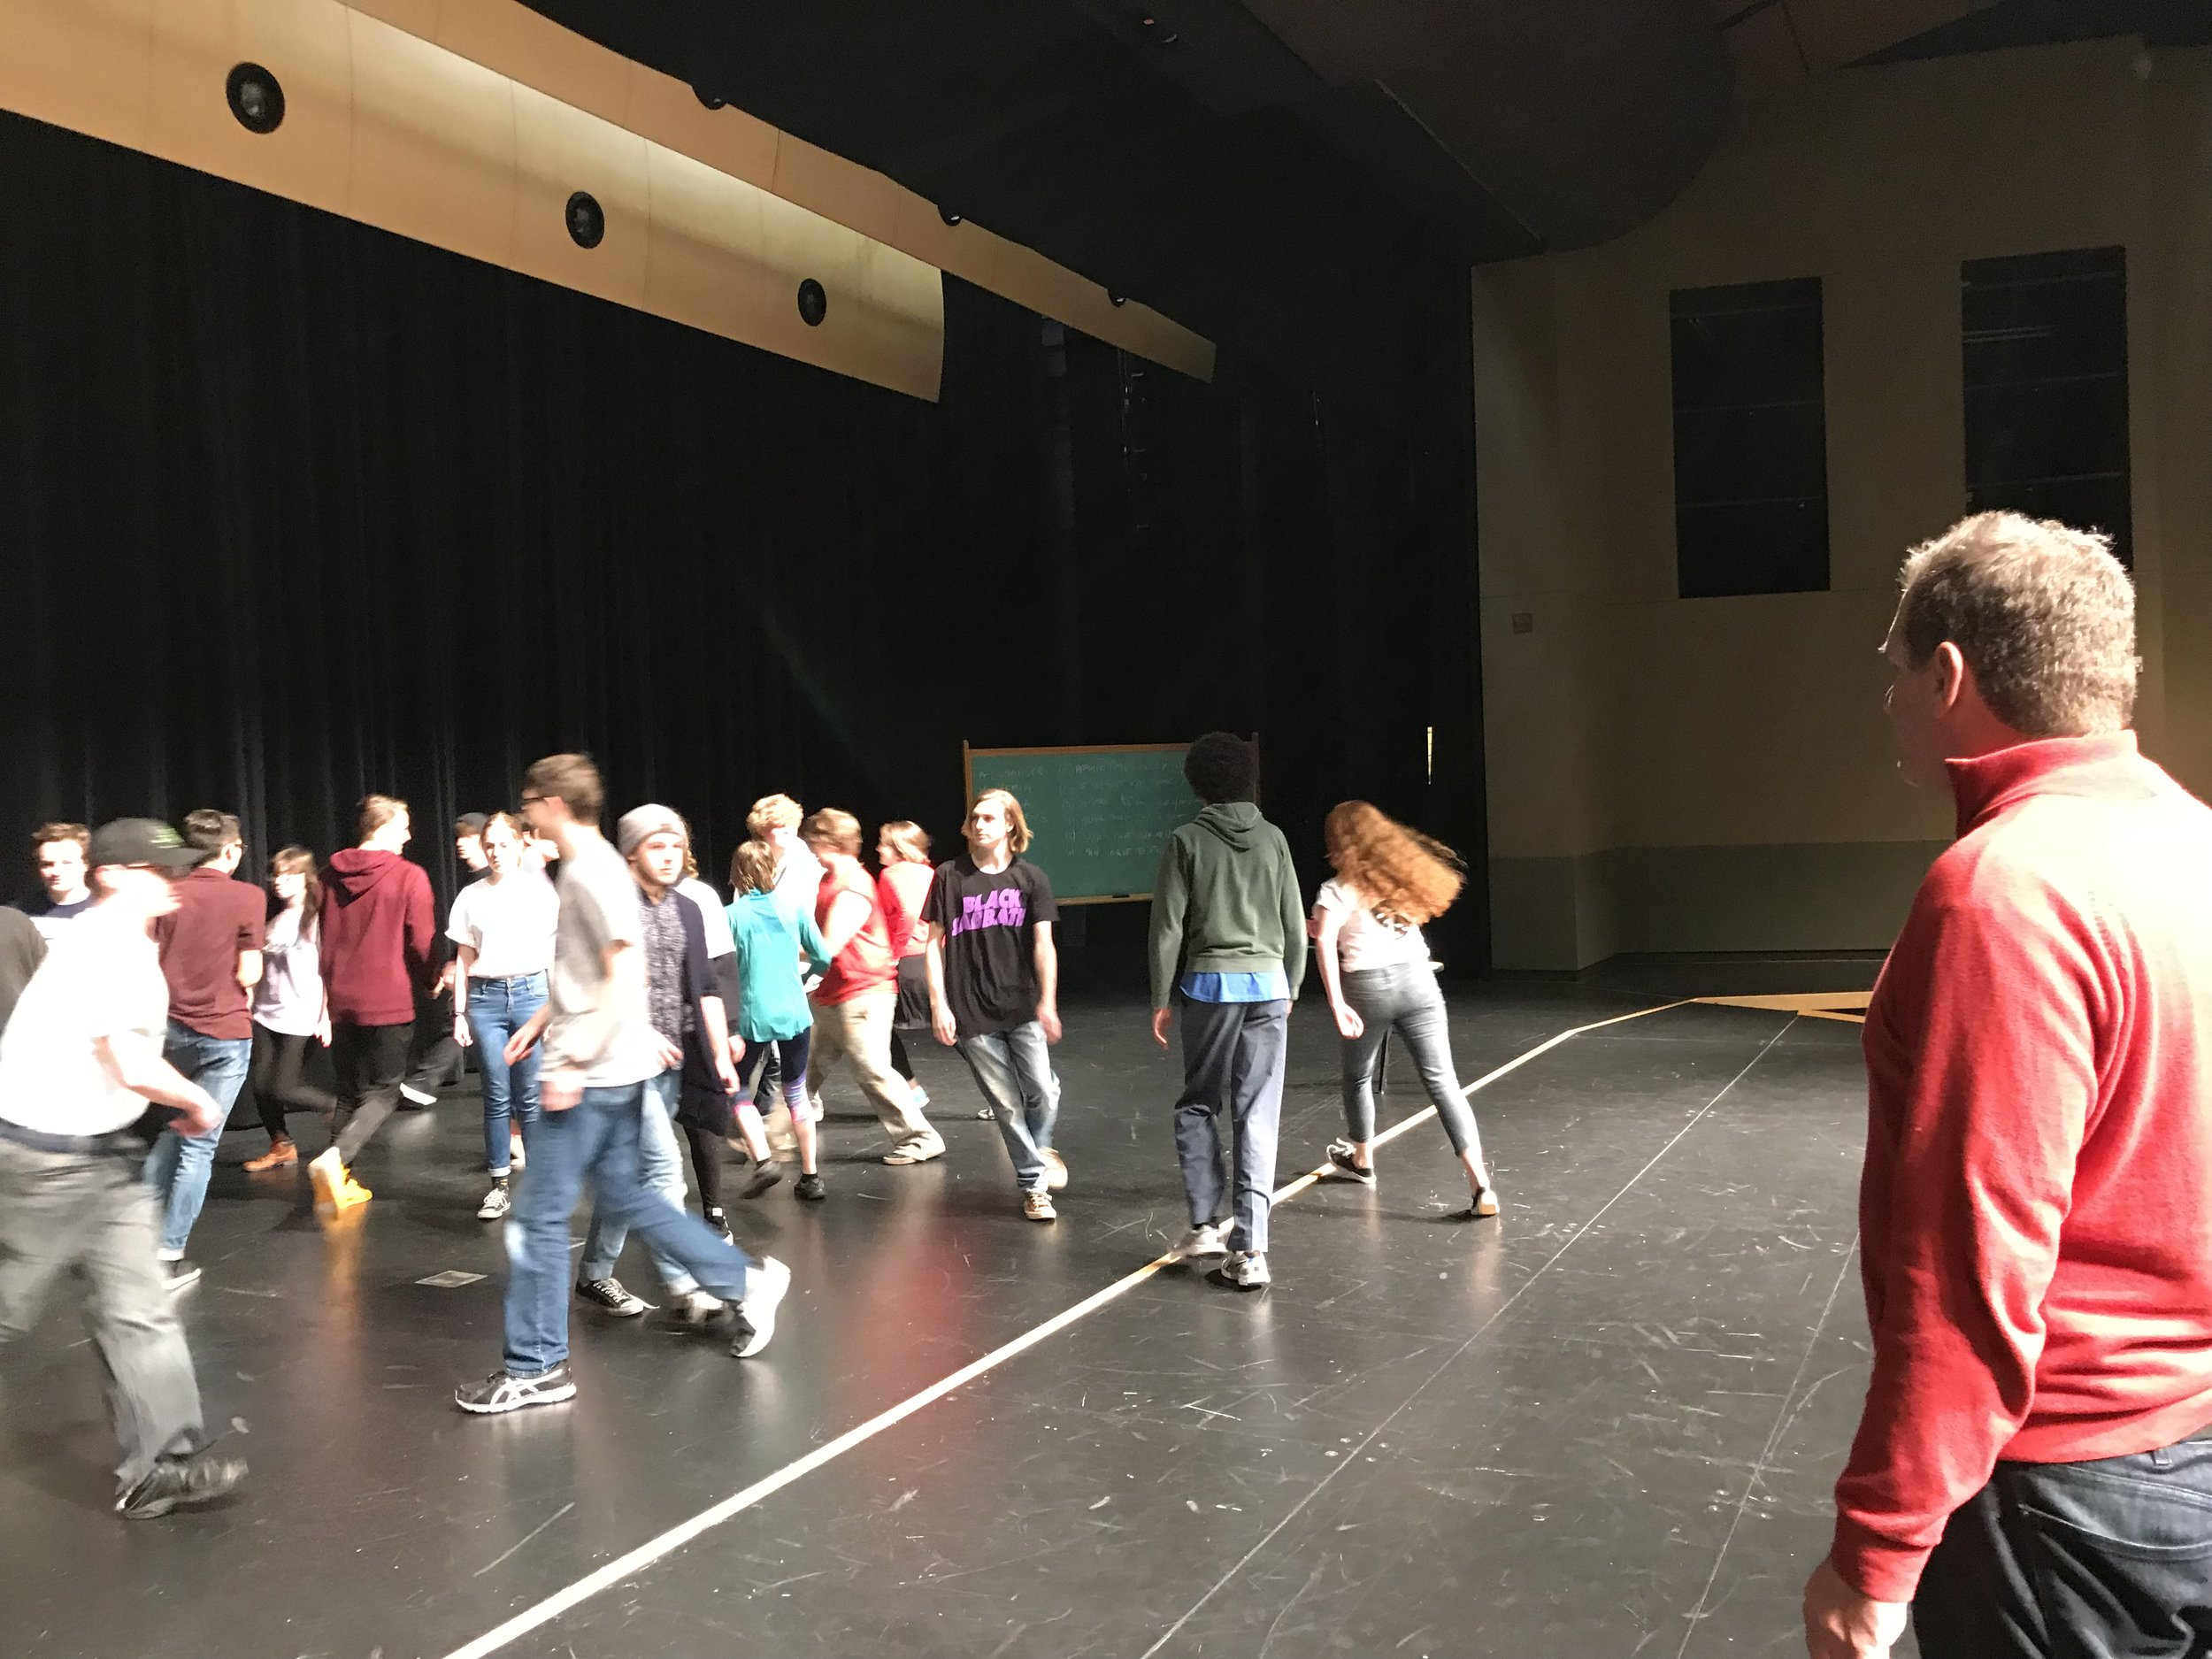 Teaching at Shadle High School in Spokane, WA